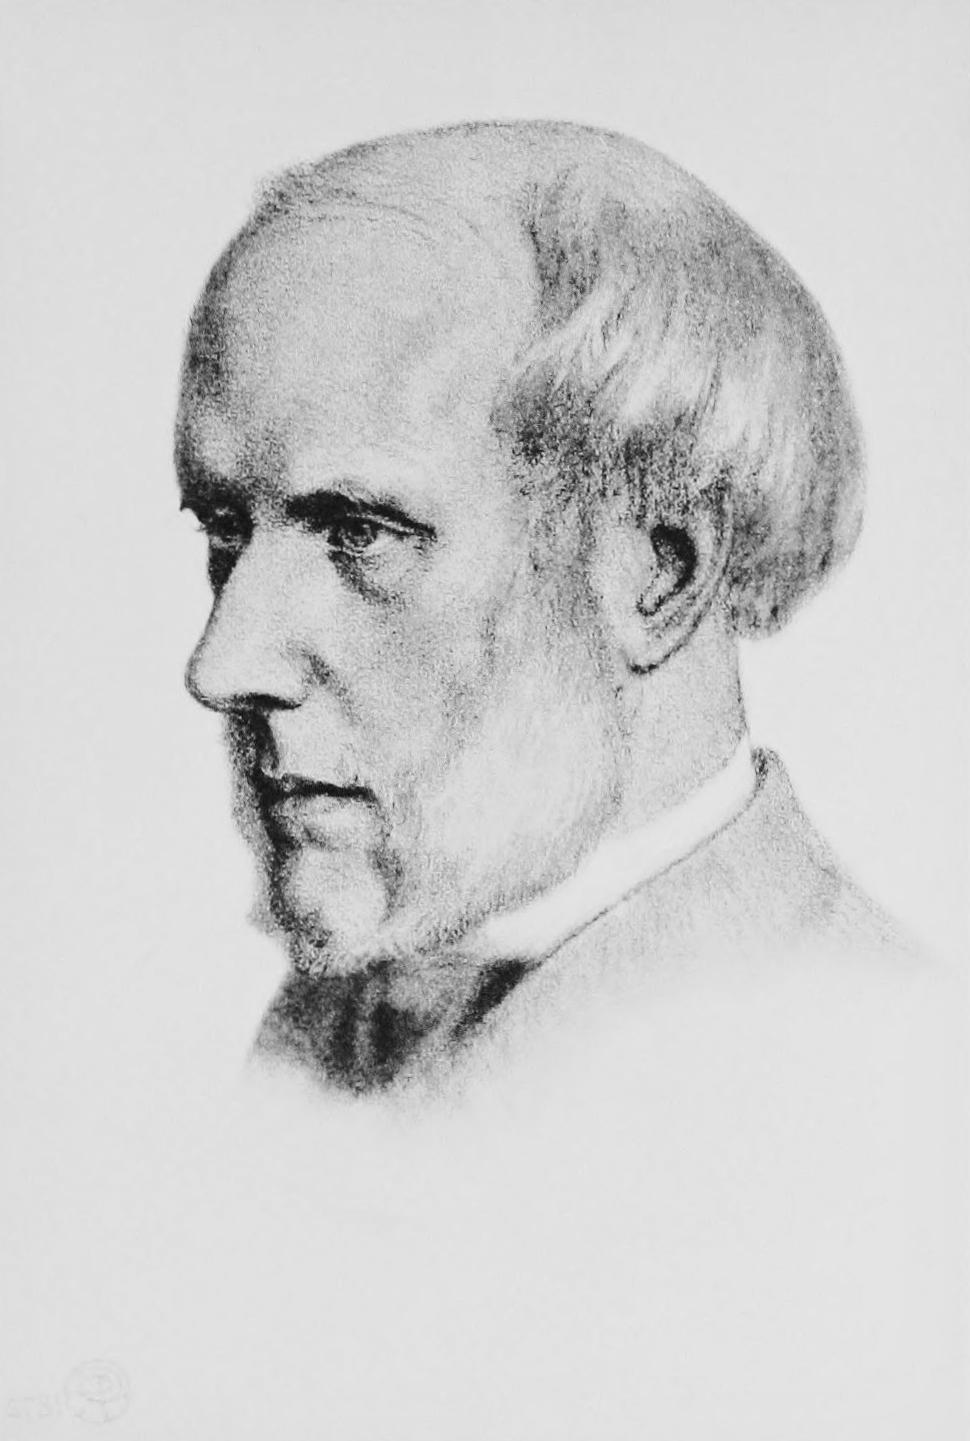 https://upload.wikimedia.org/wikipedia/commons/6/66/Thomas_Gordon_Hake.jpg